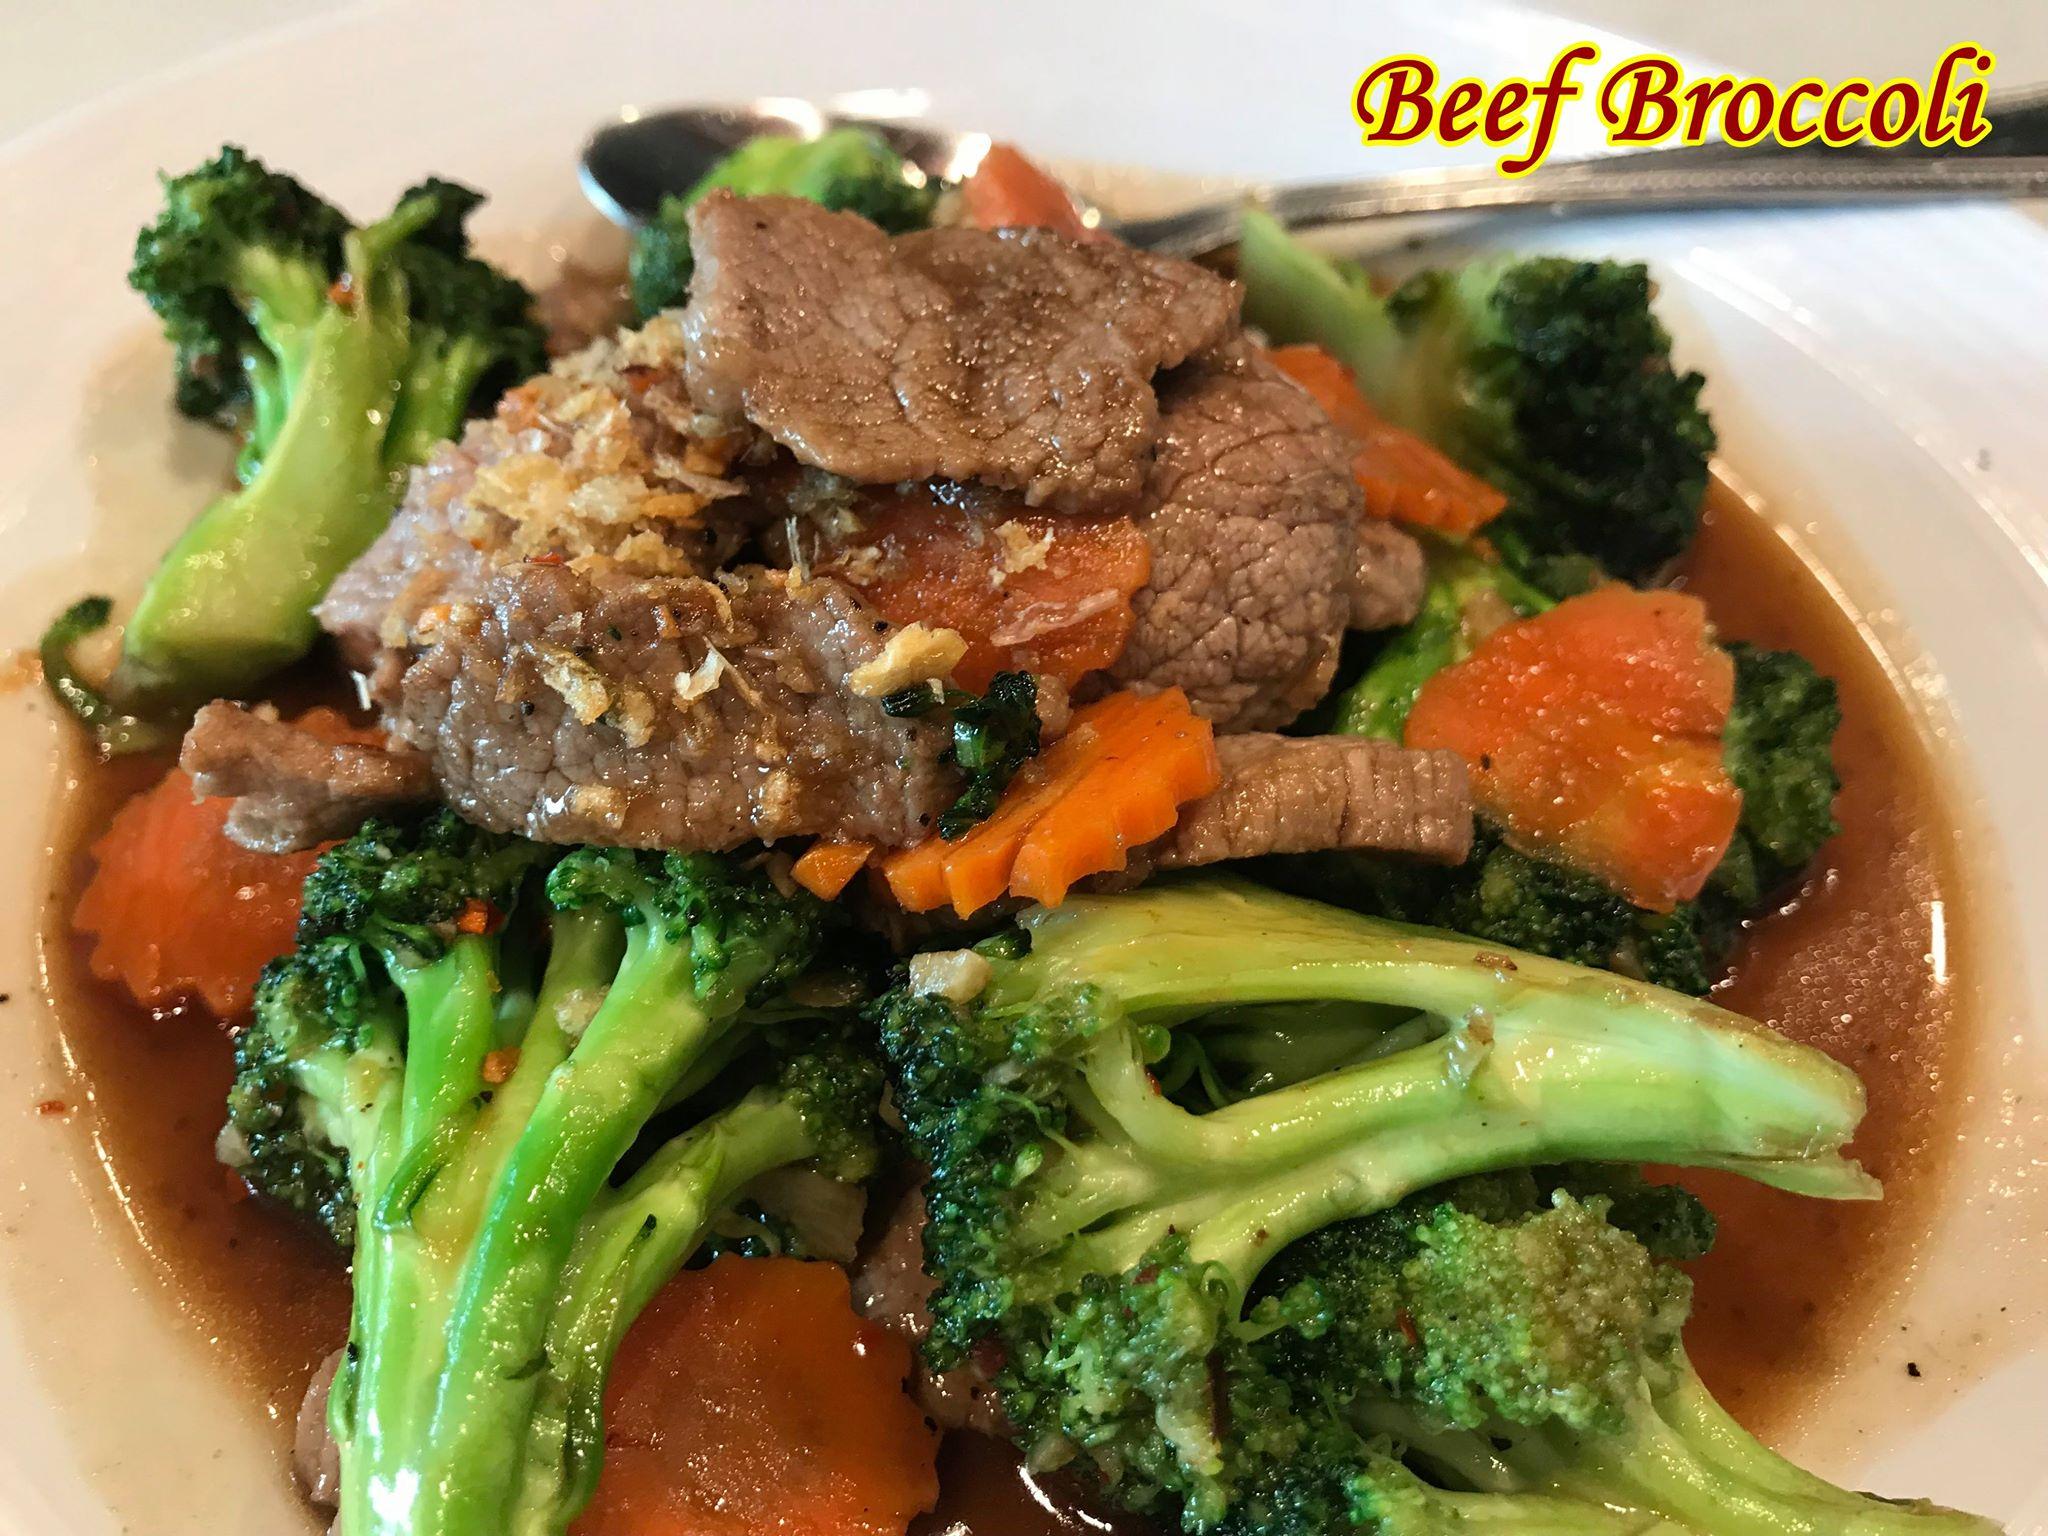 Beef Broccoli (Lunch) Image